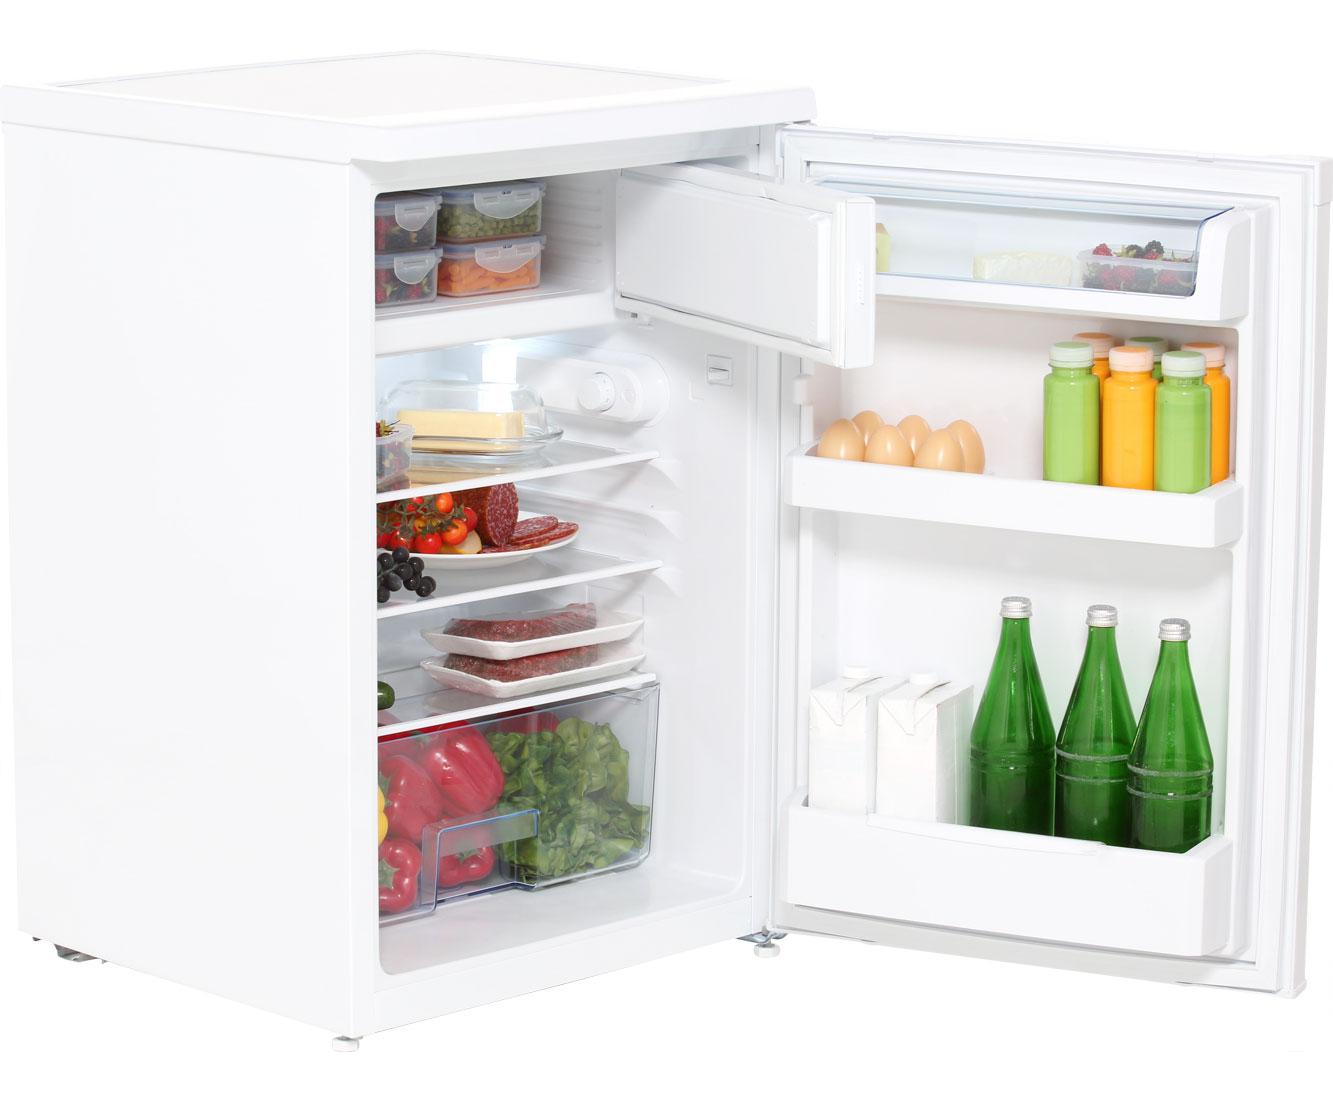 Gorenje Kühlschrank Höffner : Maße kühlschrank haier side by side kühlschrank günstige